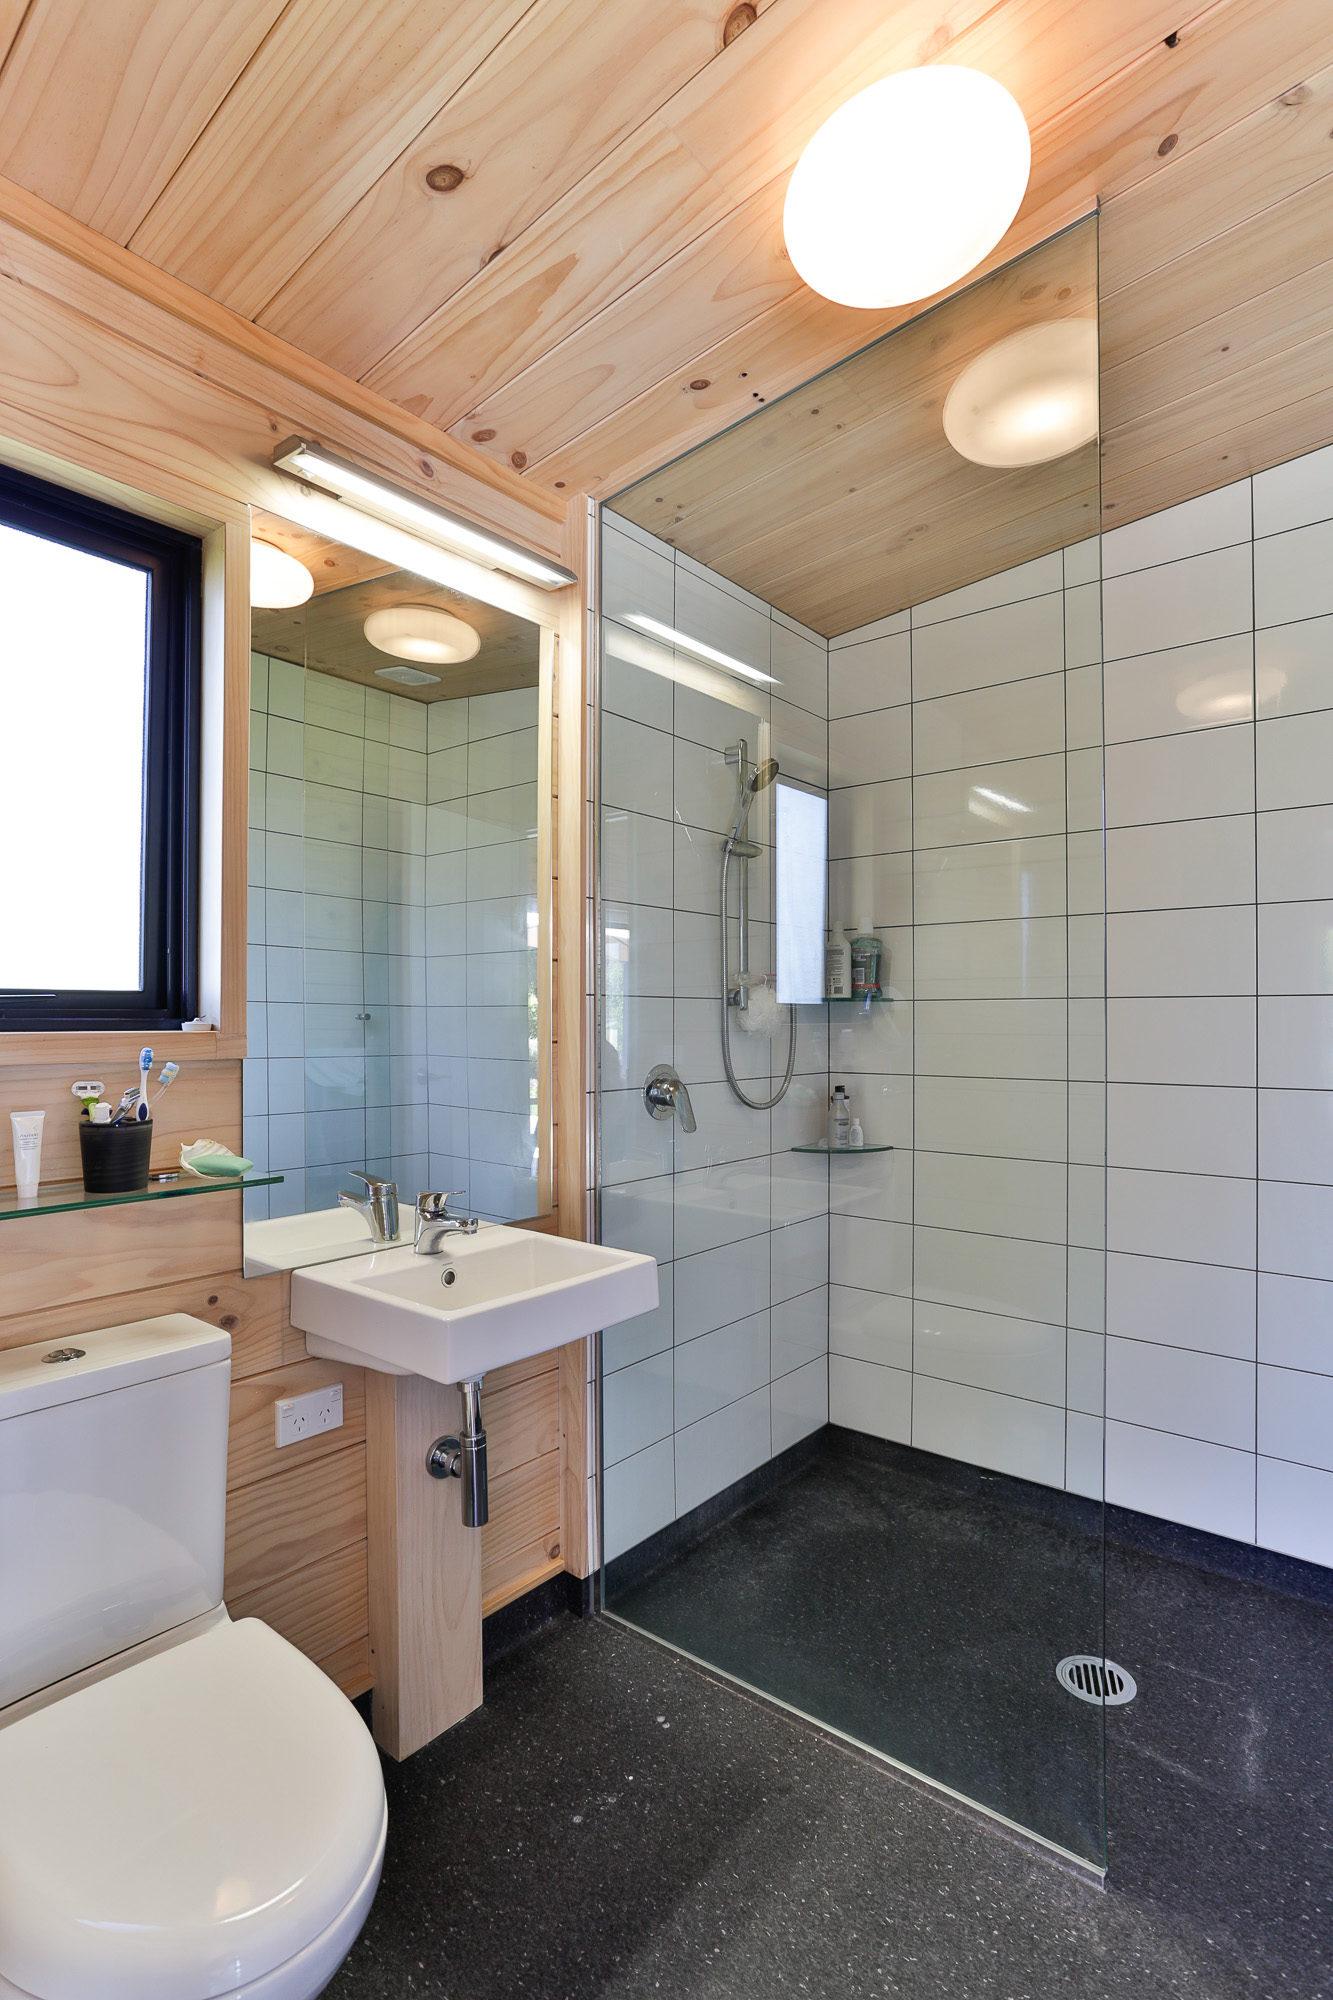 Lockwood bathroom with tiles